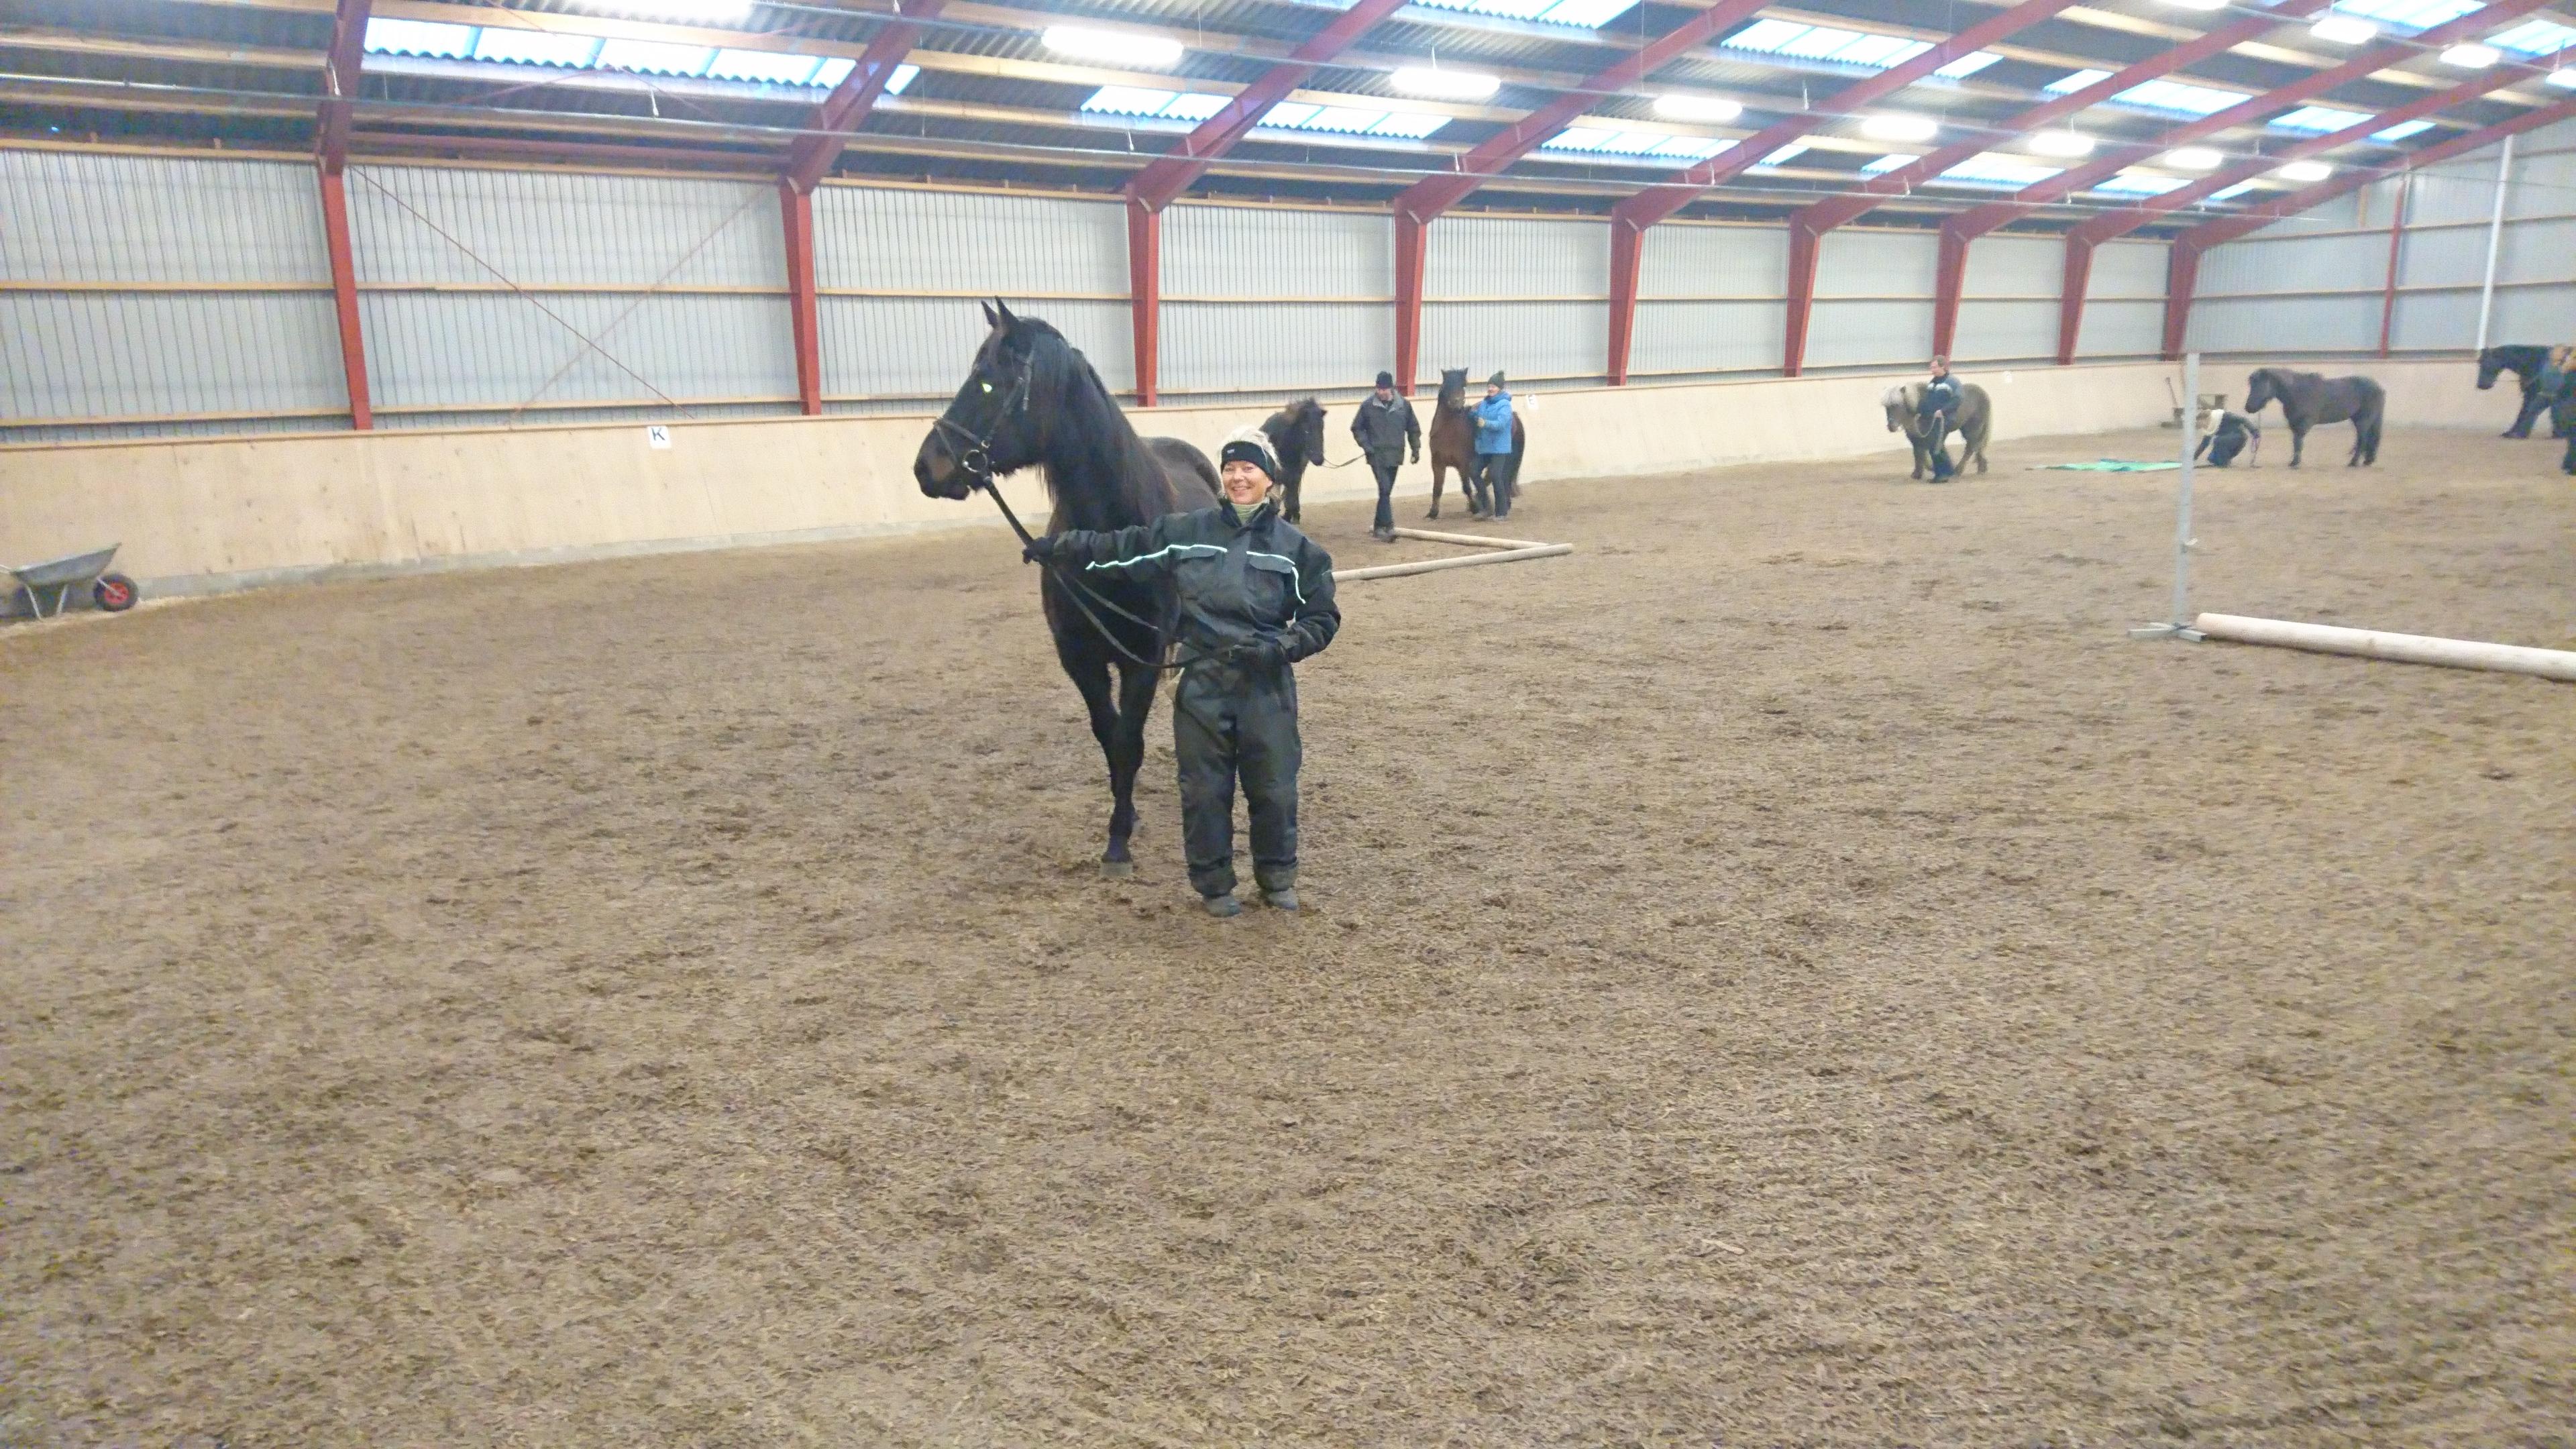 Januar 2018: Her er Hanne og Galanzo til Nytårs Ridning. Vi laver agility med hestene. De skal gå over presenninger og over cavalettis. Jeg ved ikke om hest eller trækker har det sjovest.